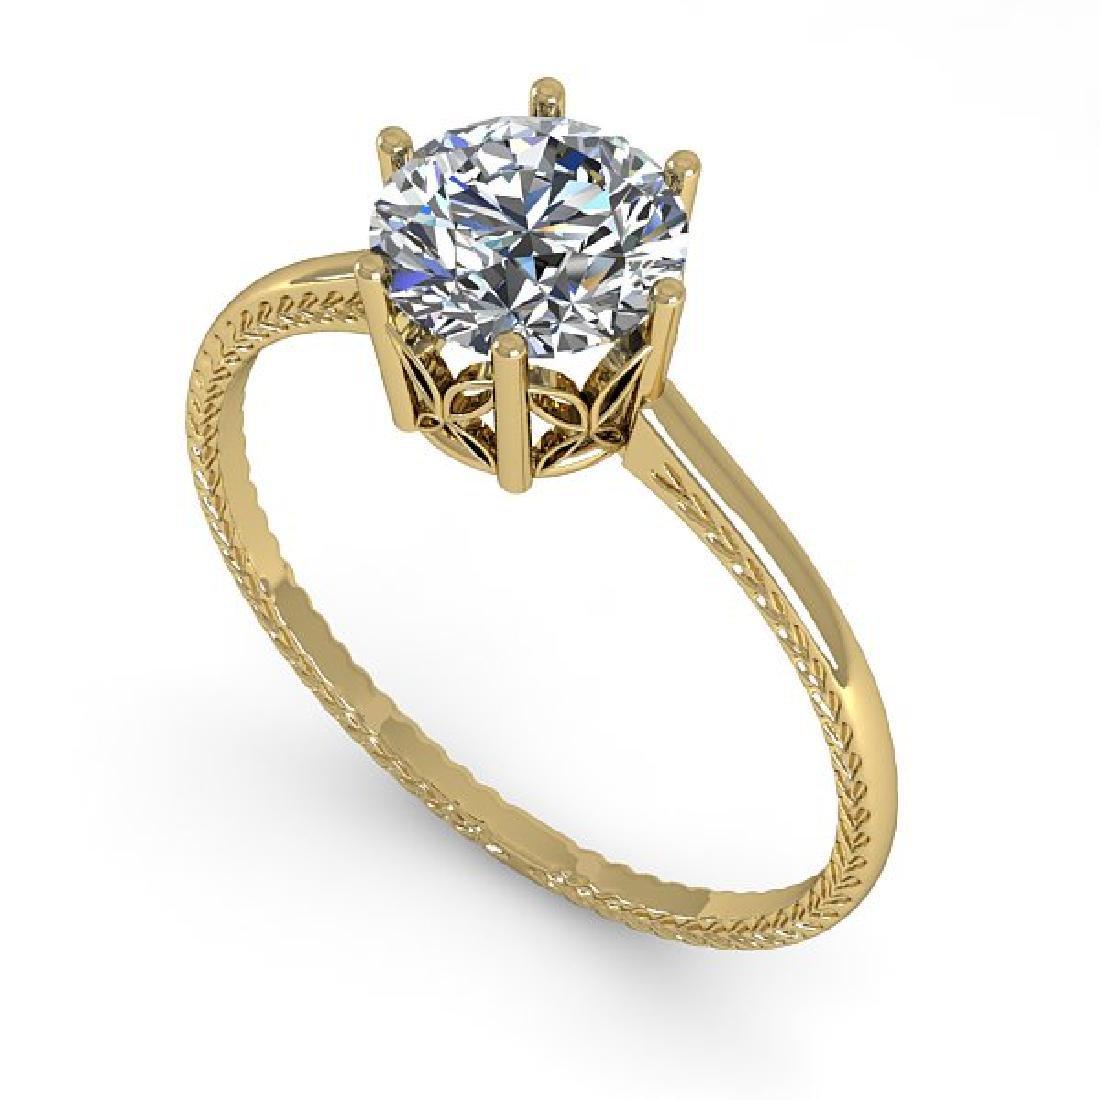 1.0 CTW Certified VS/SI Diamond Ring 14K Yellow Gold - 2